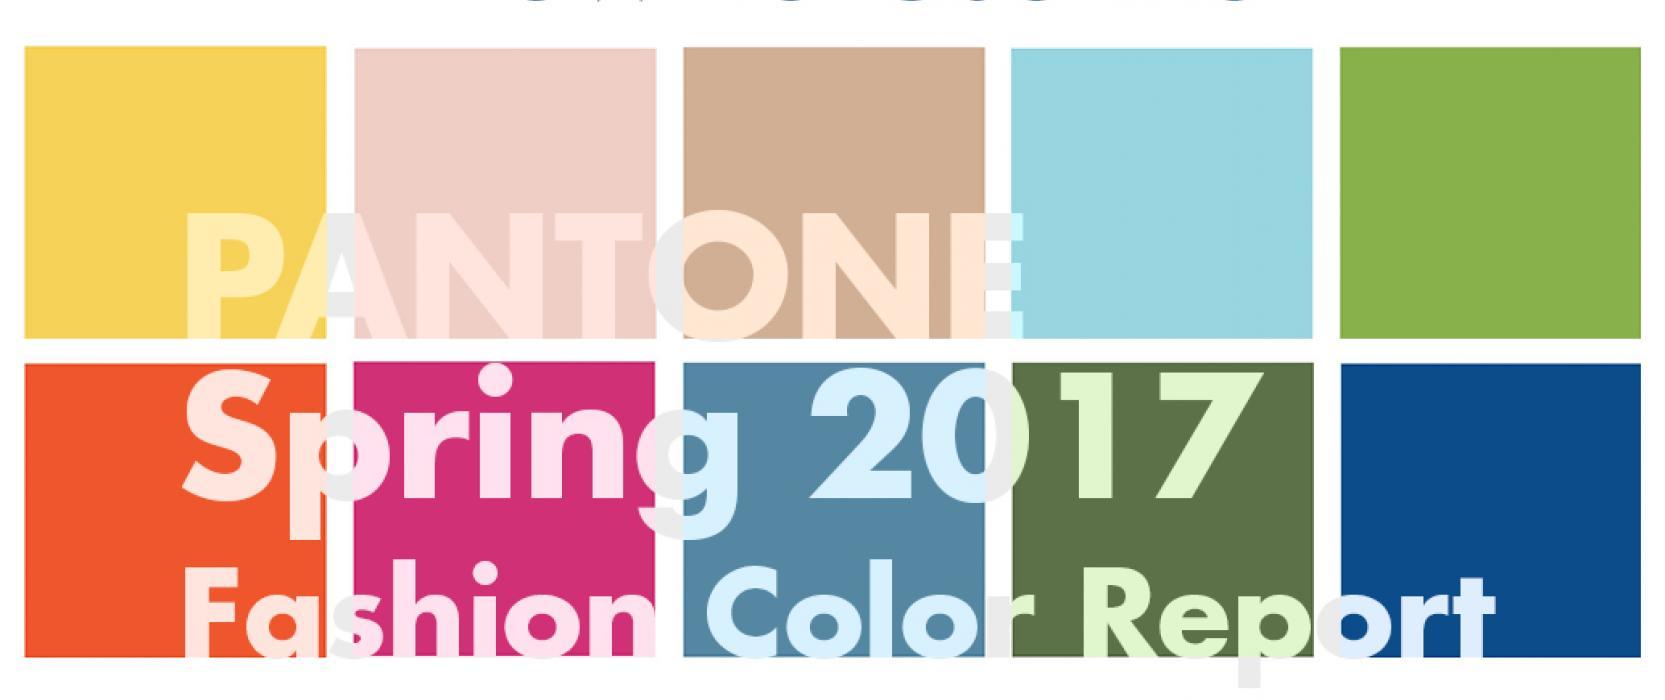 Pantone colors spring 2017 trending home design, interior design